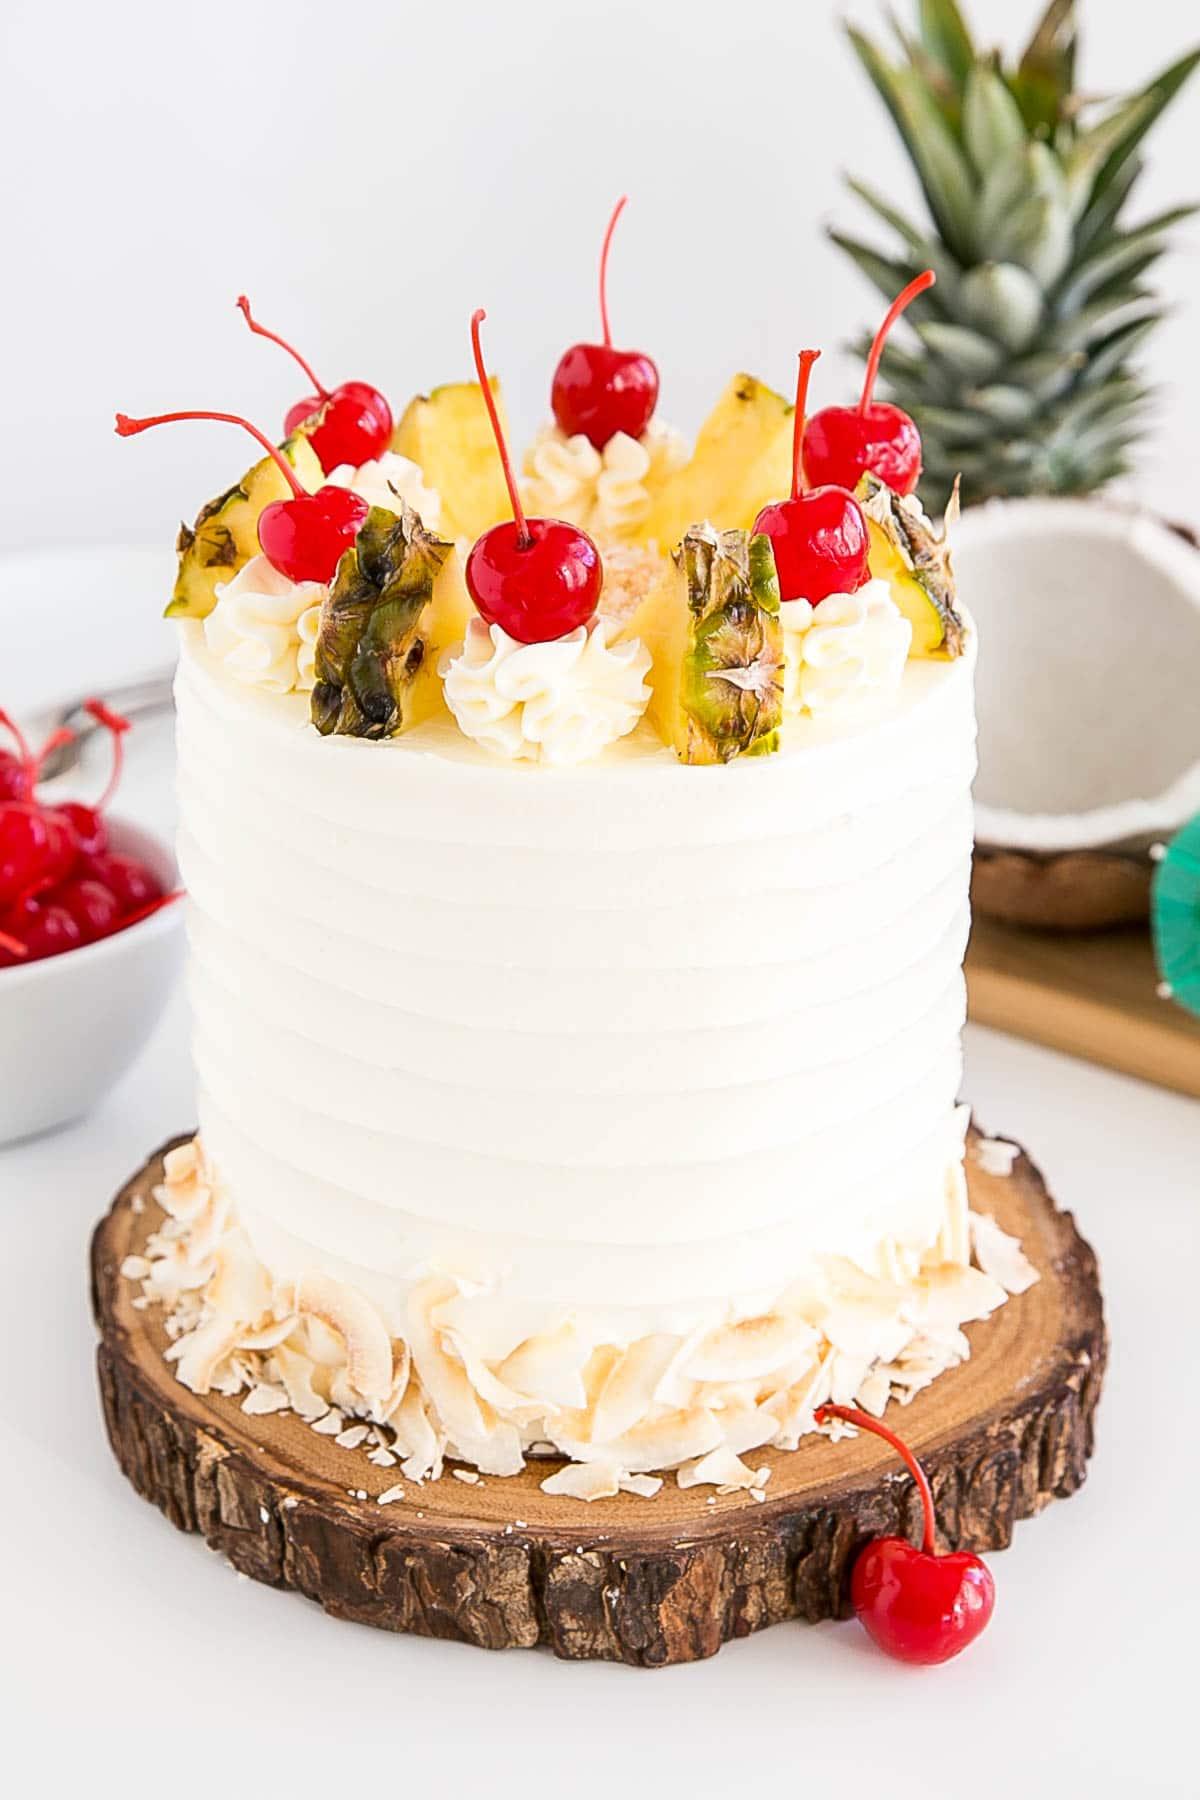 Angled shot of the cake